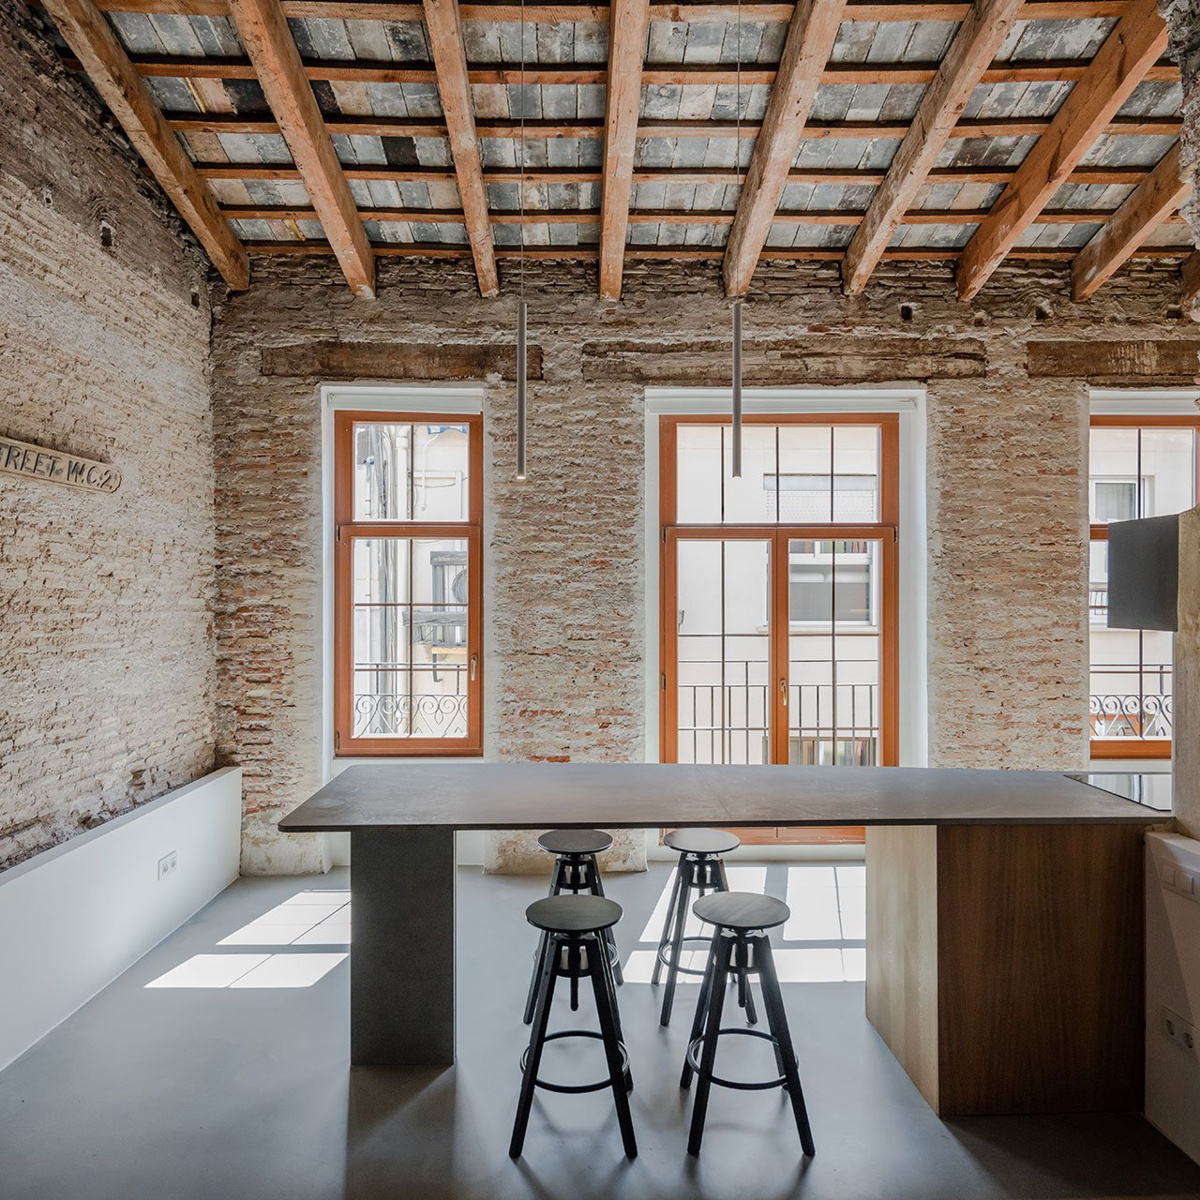 Roberto di Donato Architecture (Великобритания). Квартира в Валенсии